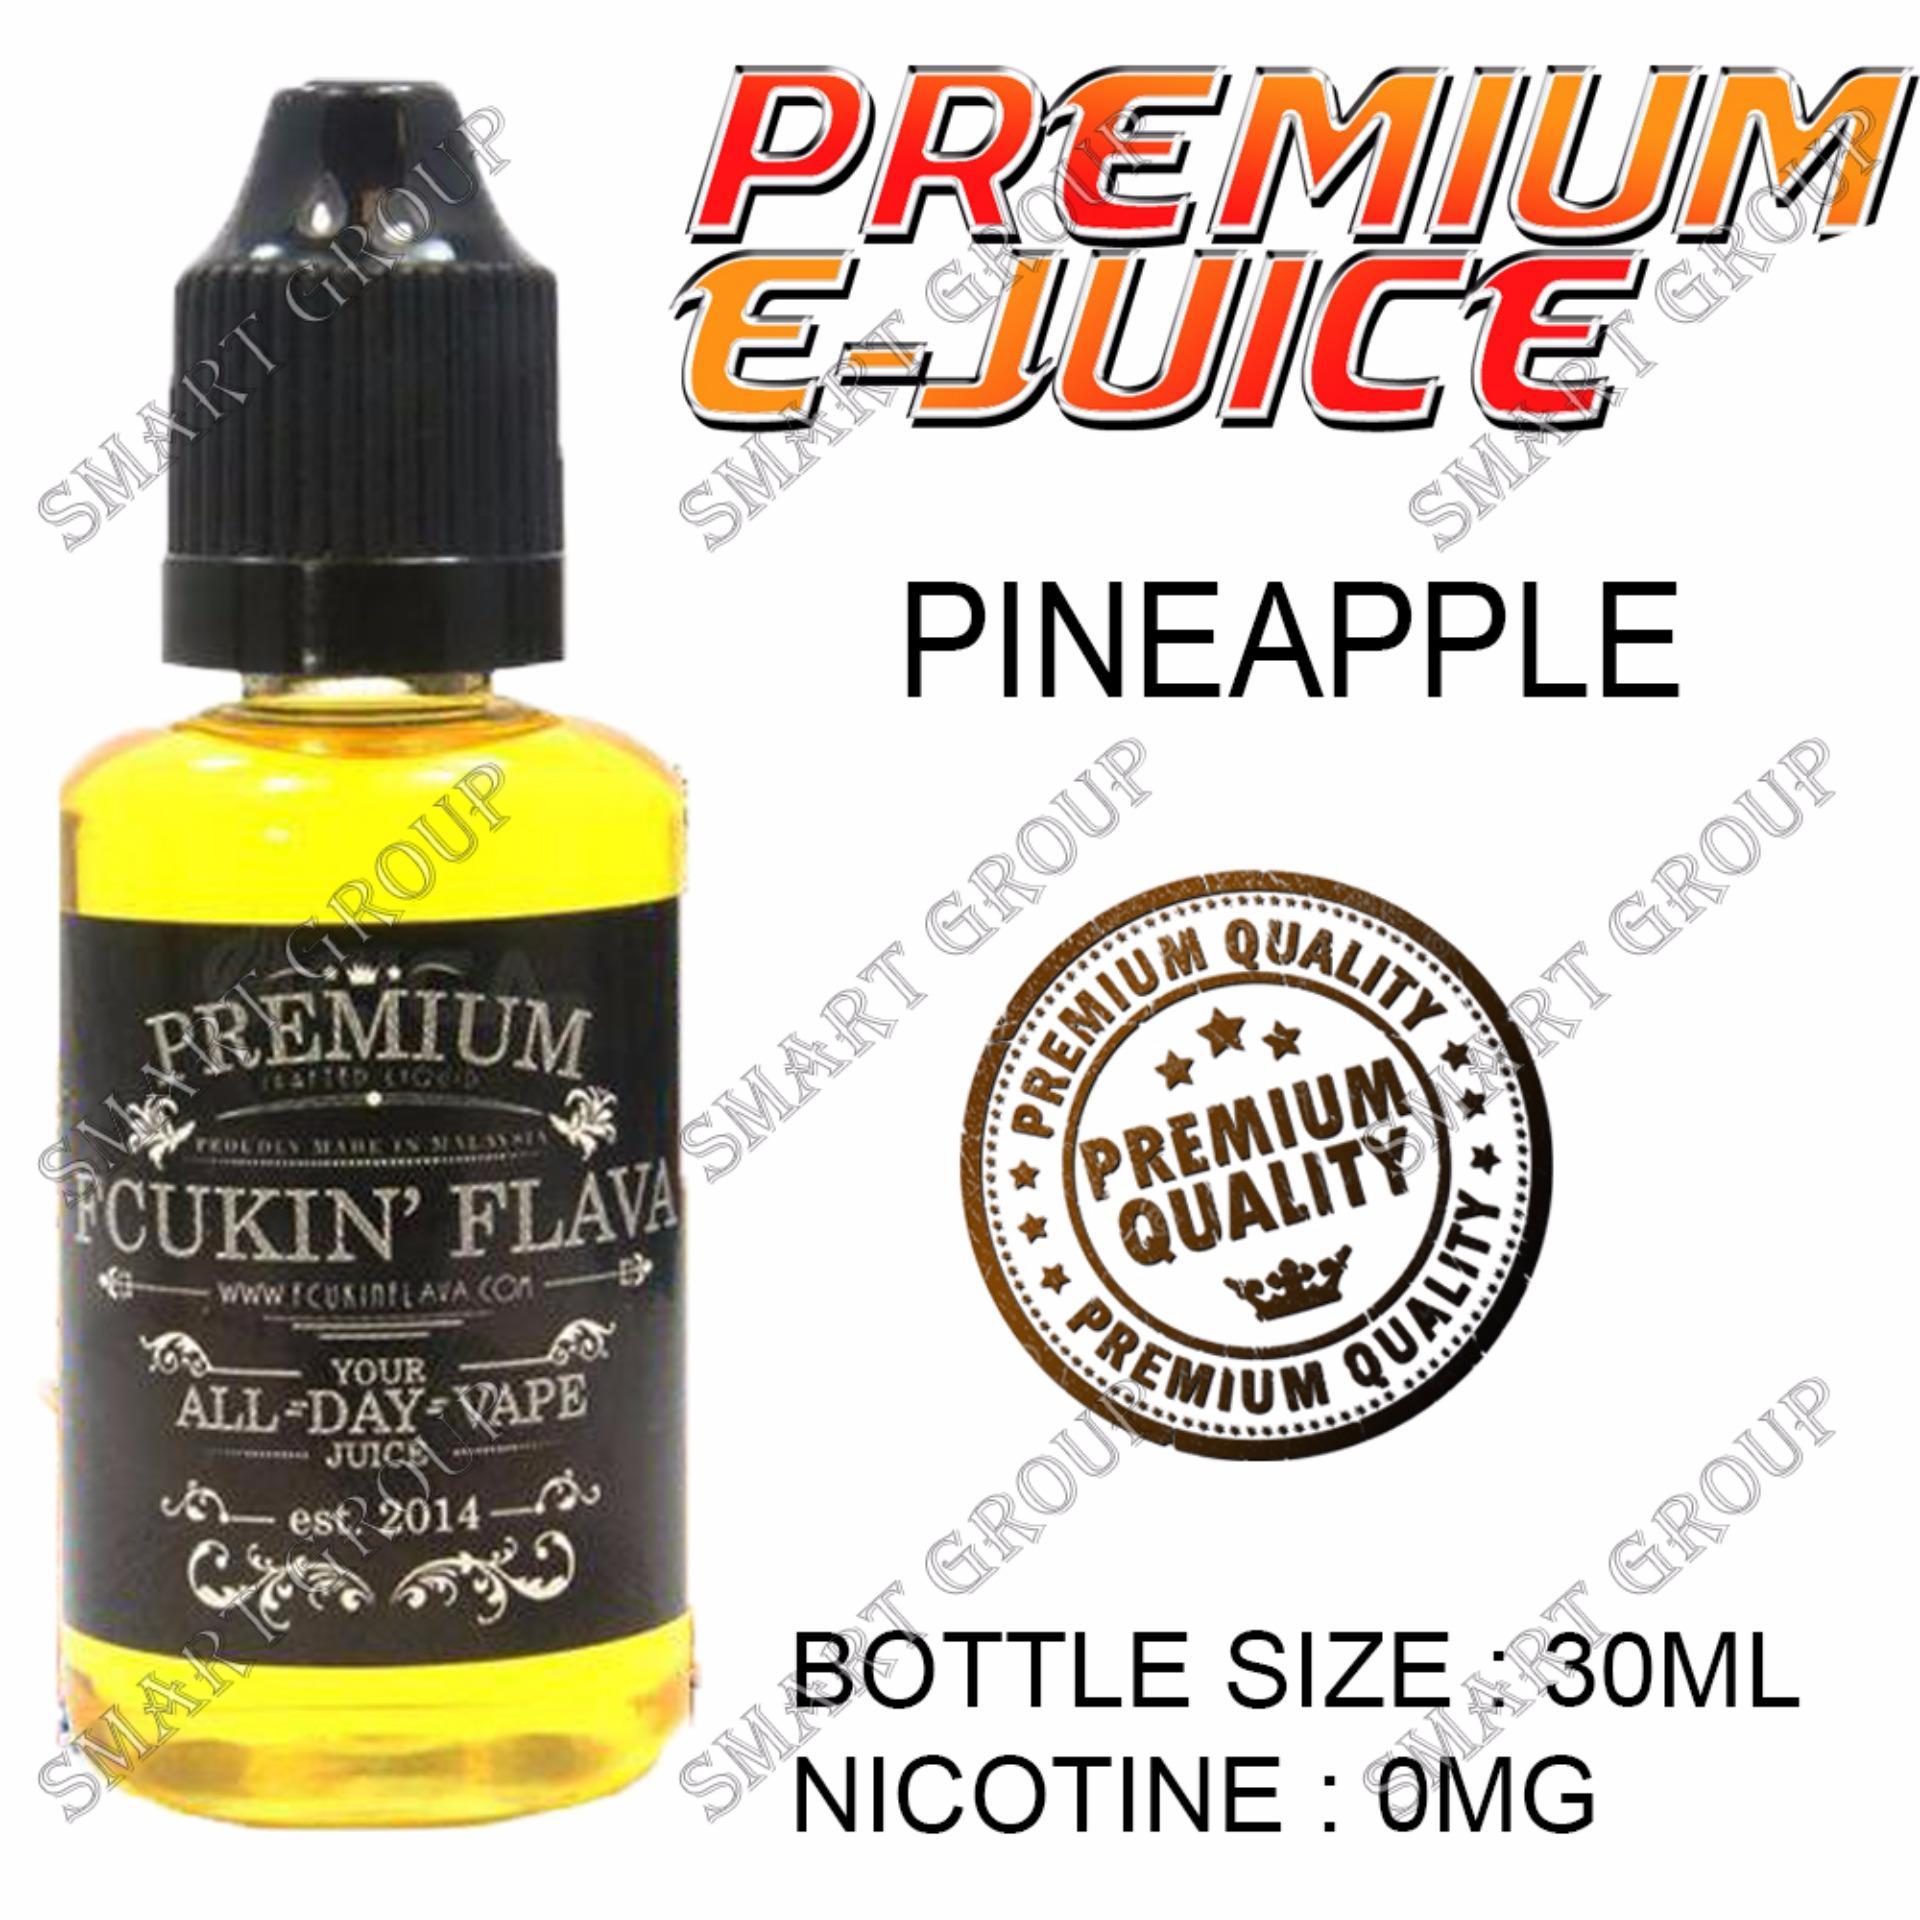 E-Juice Premium E-Liquids Fcukin Flava (Pineapple Flavor) forElectronic Cigarettes 30ml